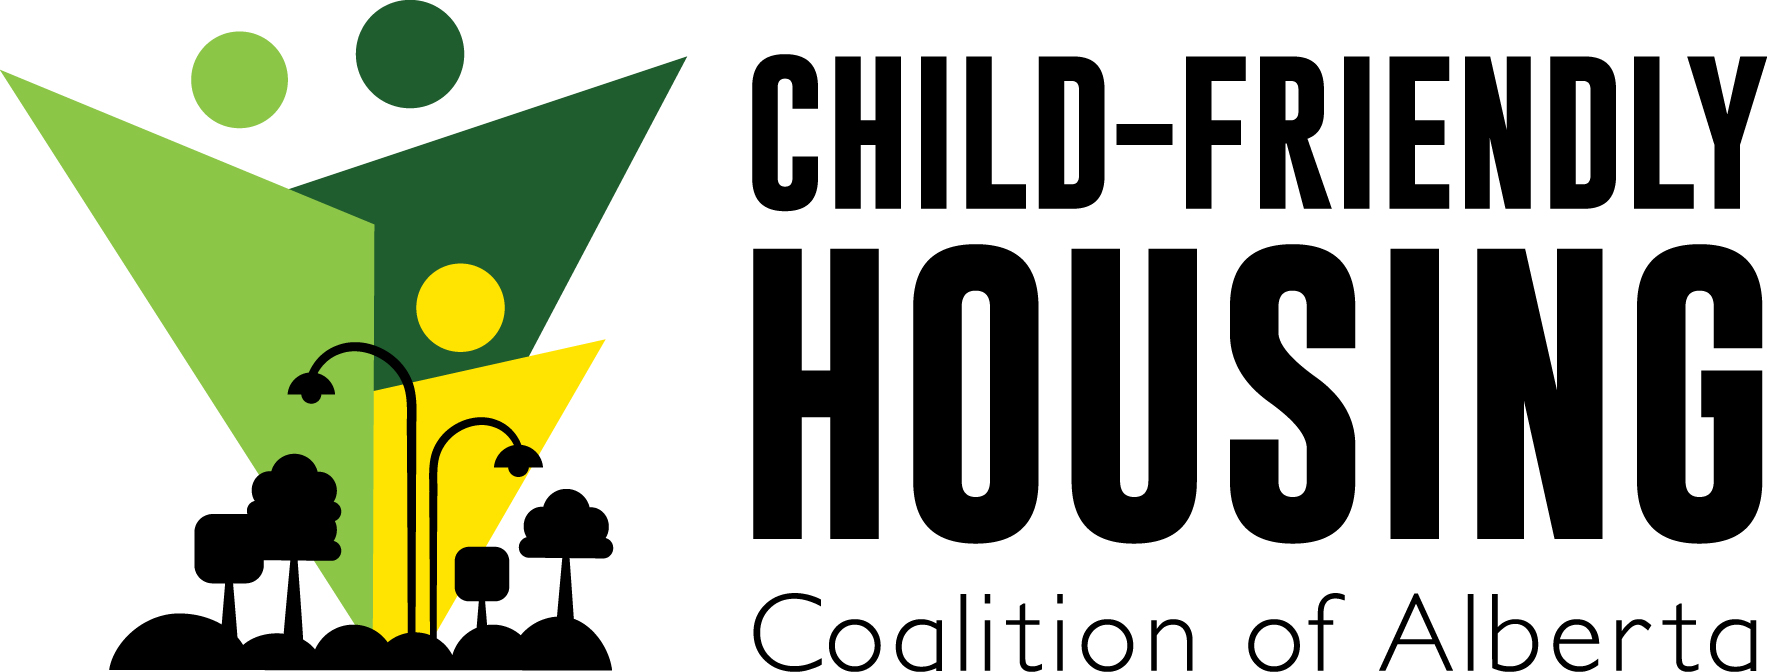 Child Friendly Housing Coalition Alberta